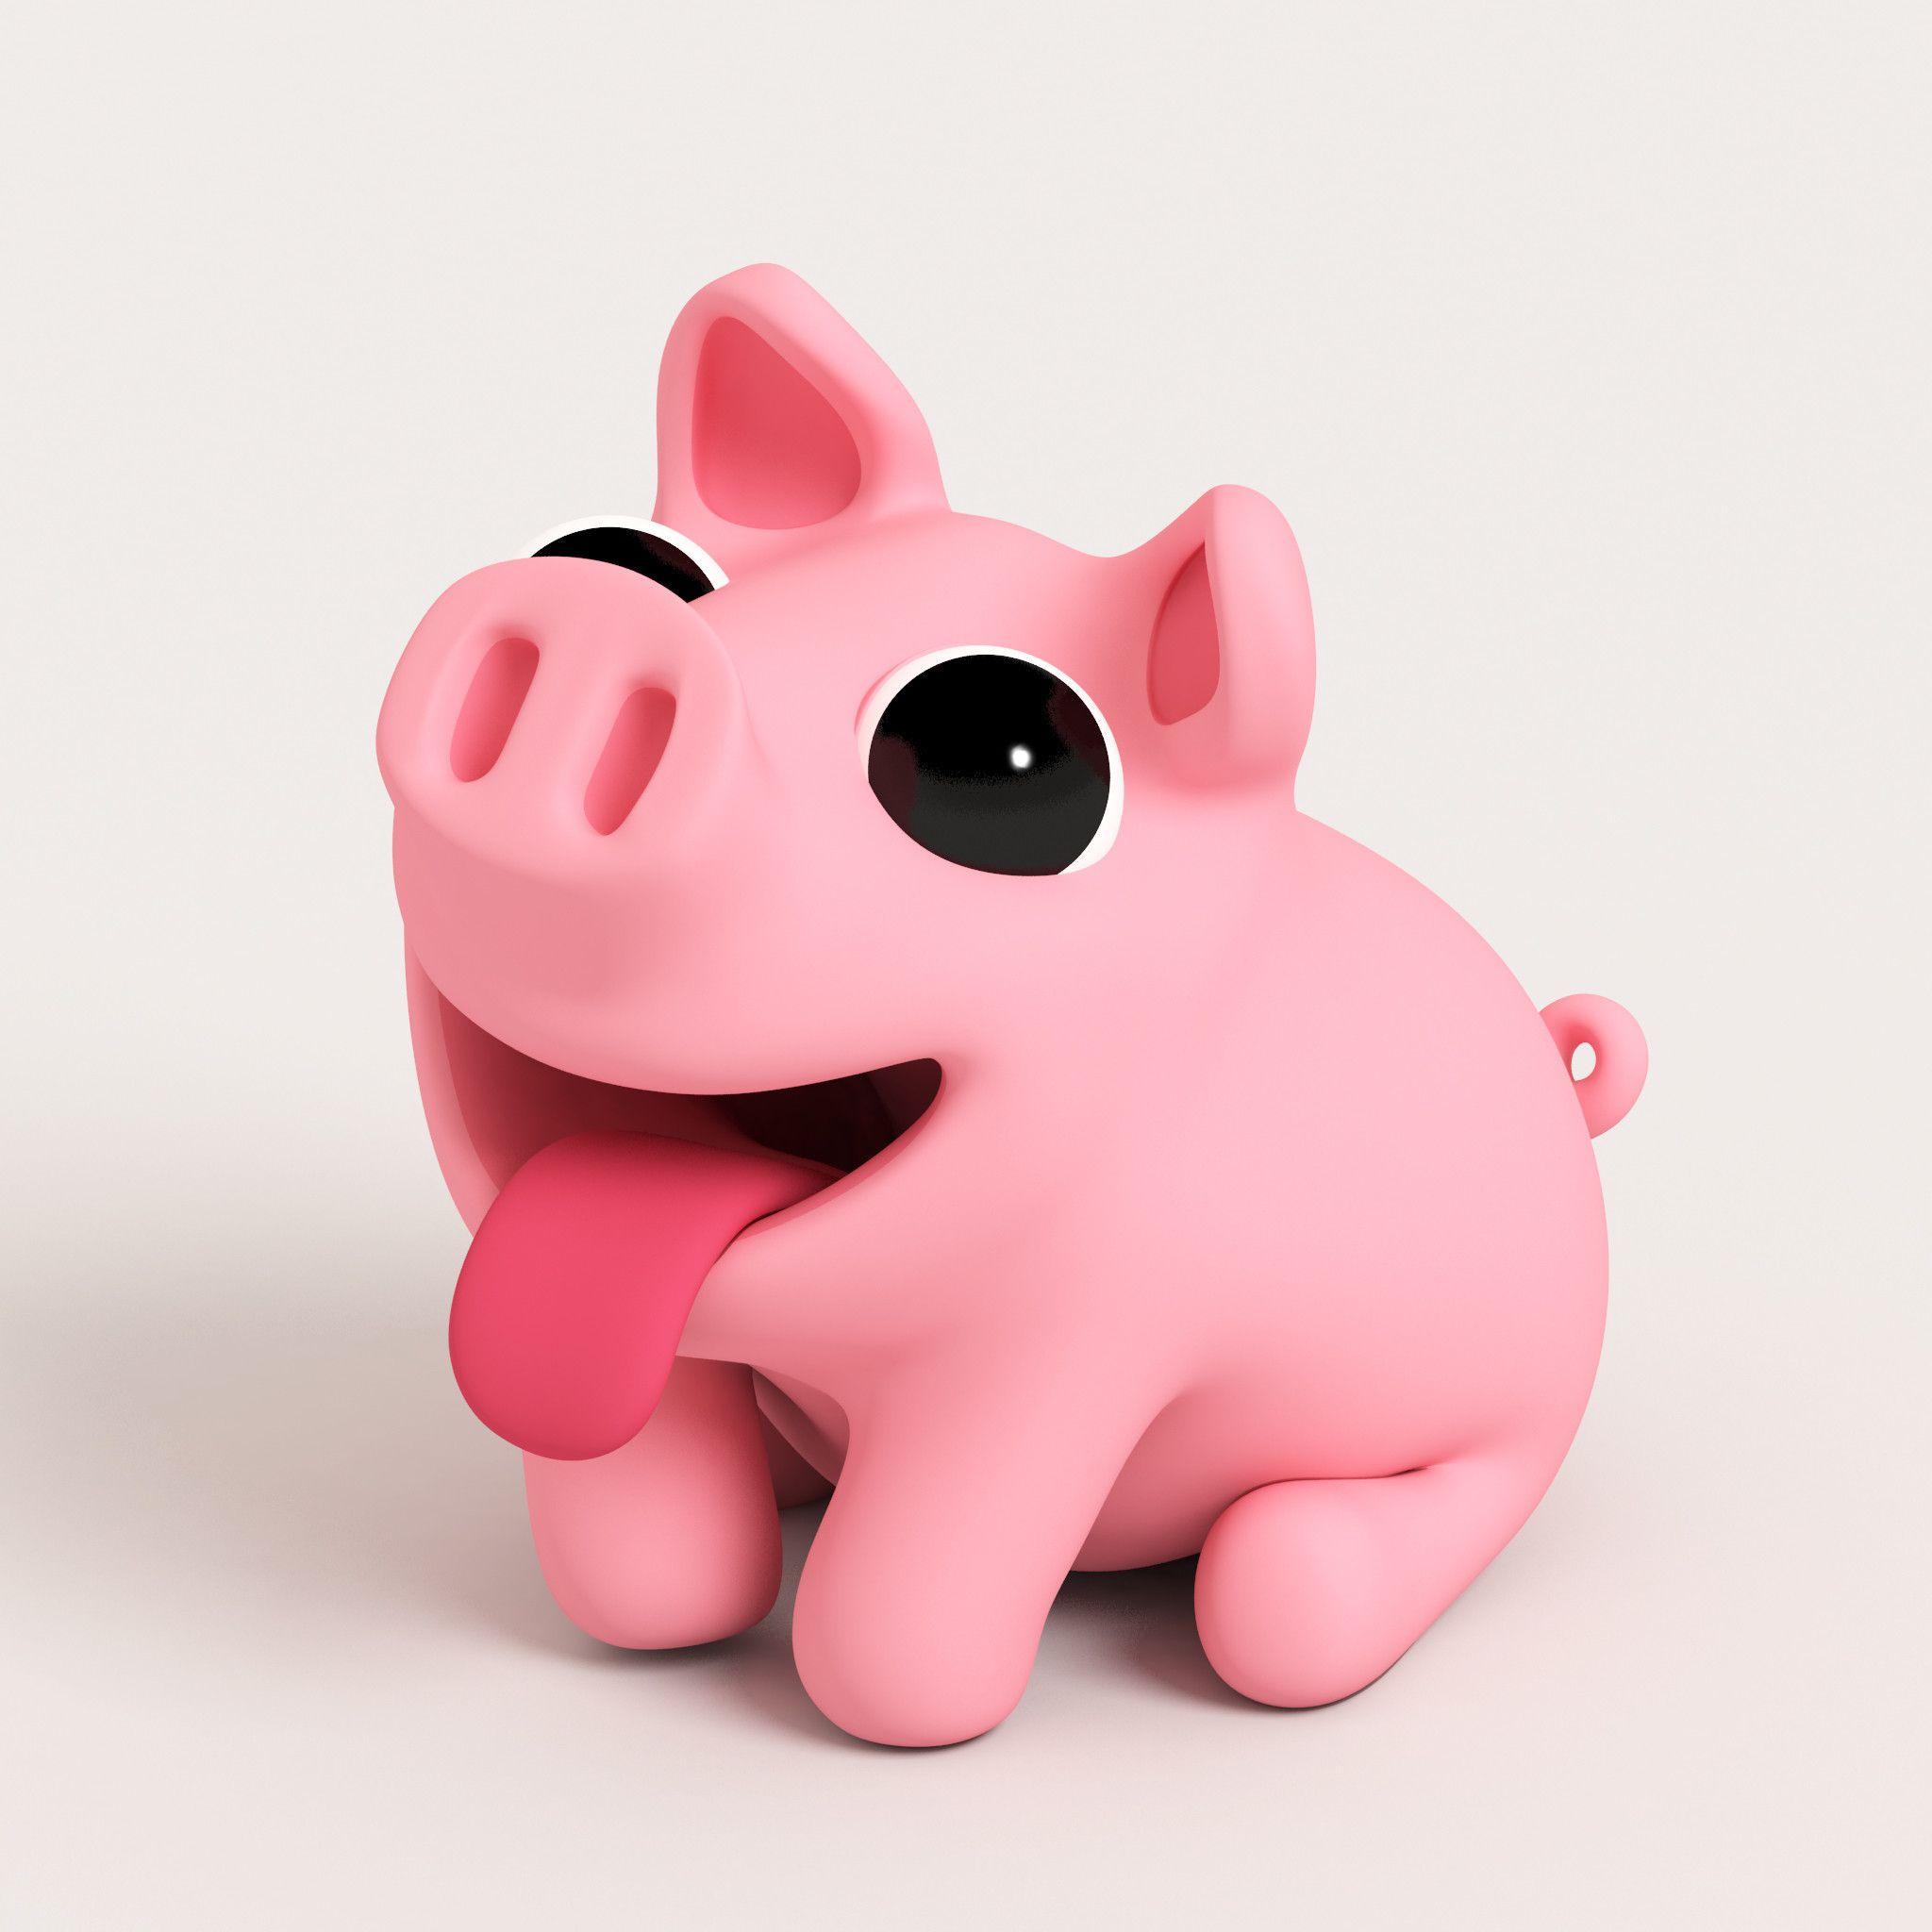 Cute Pig Wallpapers   Top Cute Pig Backgrounds   WallpaperAccess 2048x2048